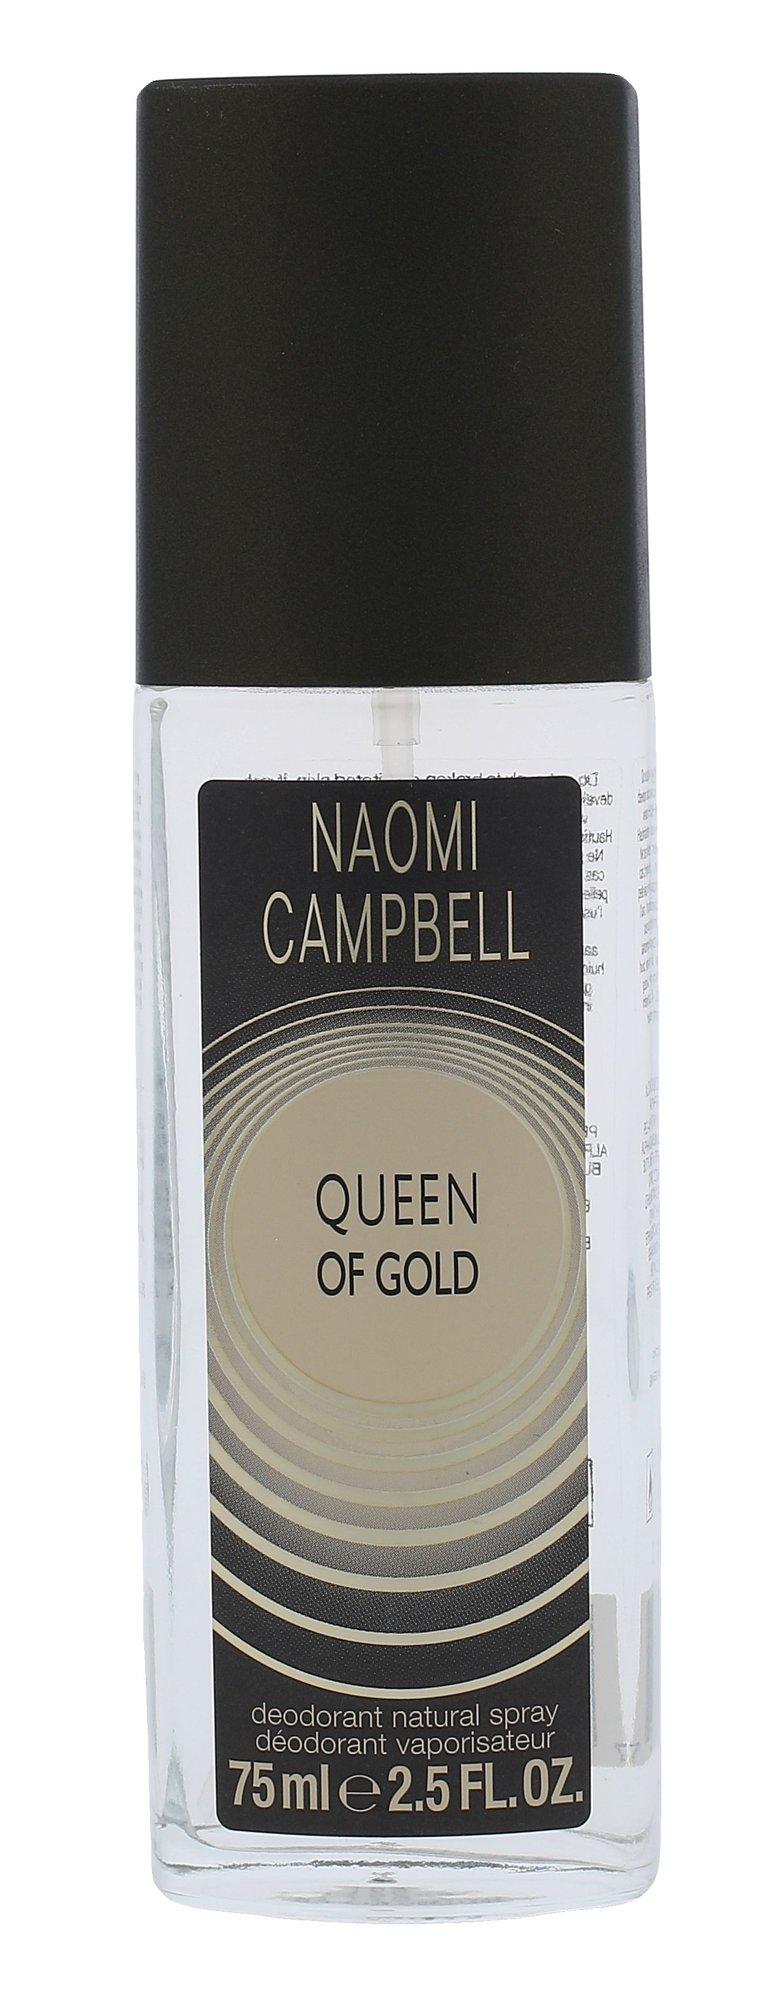 Naomi Campbell Queen Of Gold Deodorant 75ml